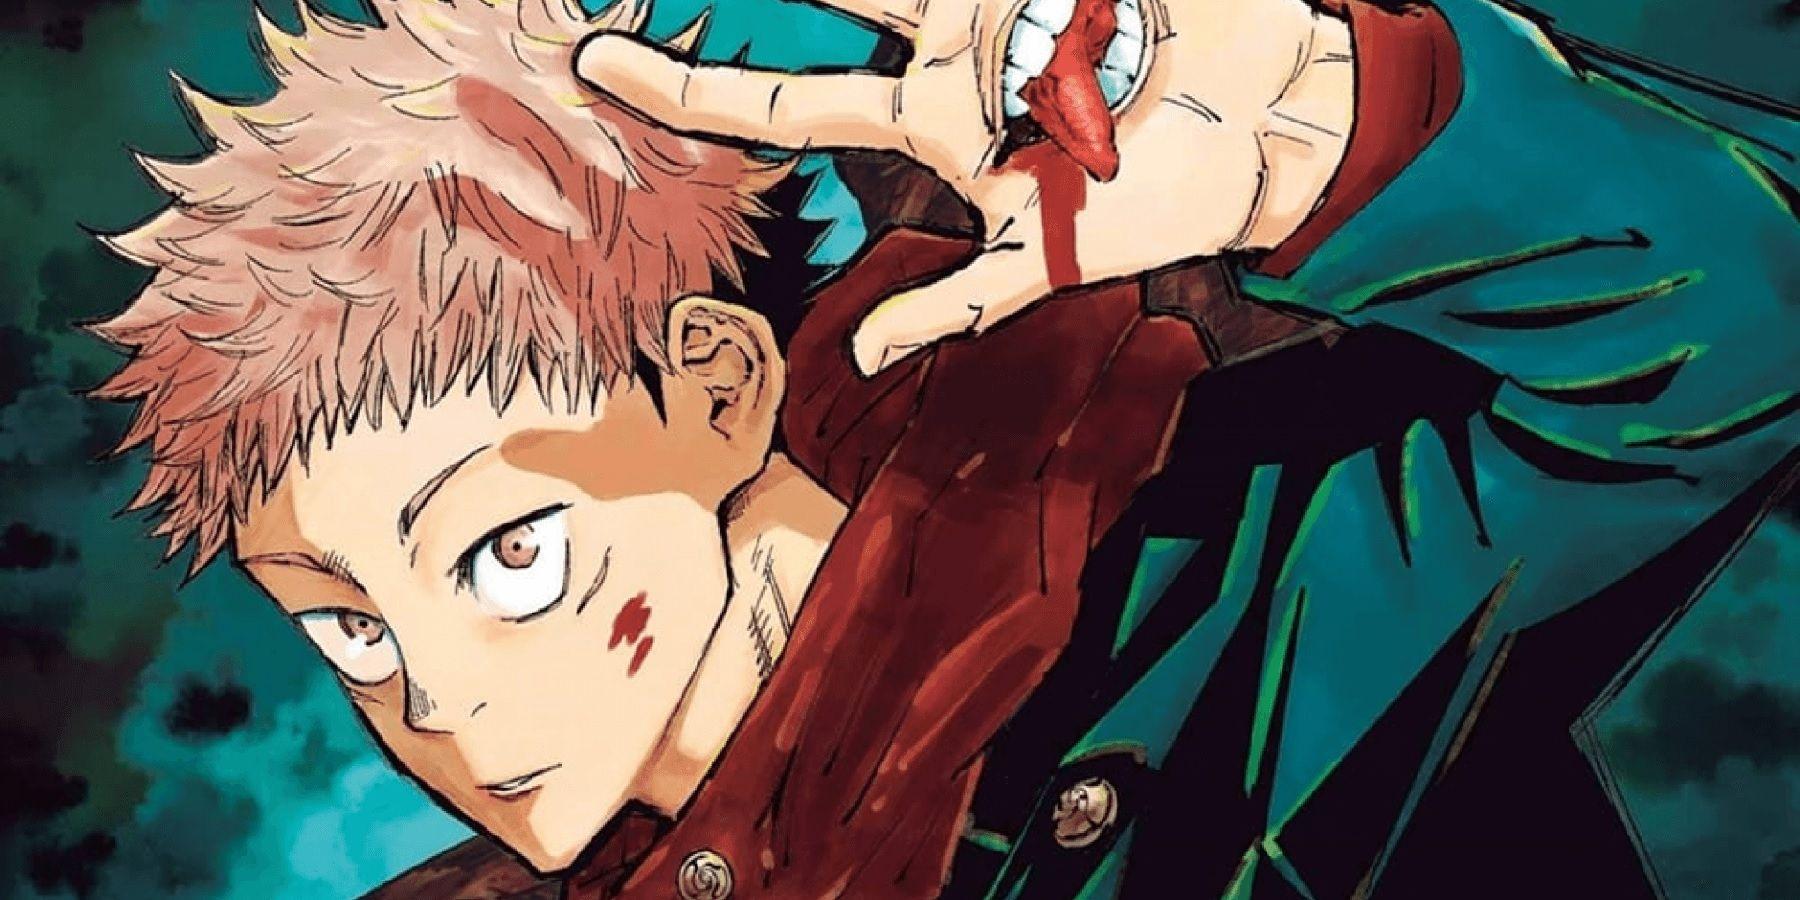 Jujutsu Kaisen Manga Reportedly Going On Indefinite Hiatus News Concerns